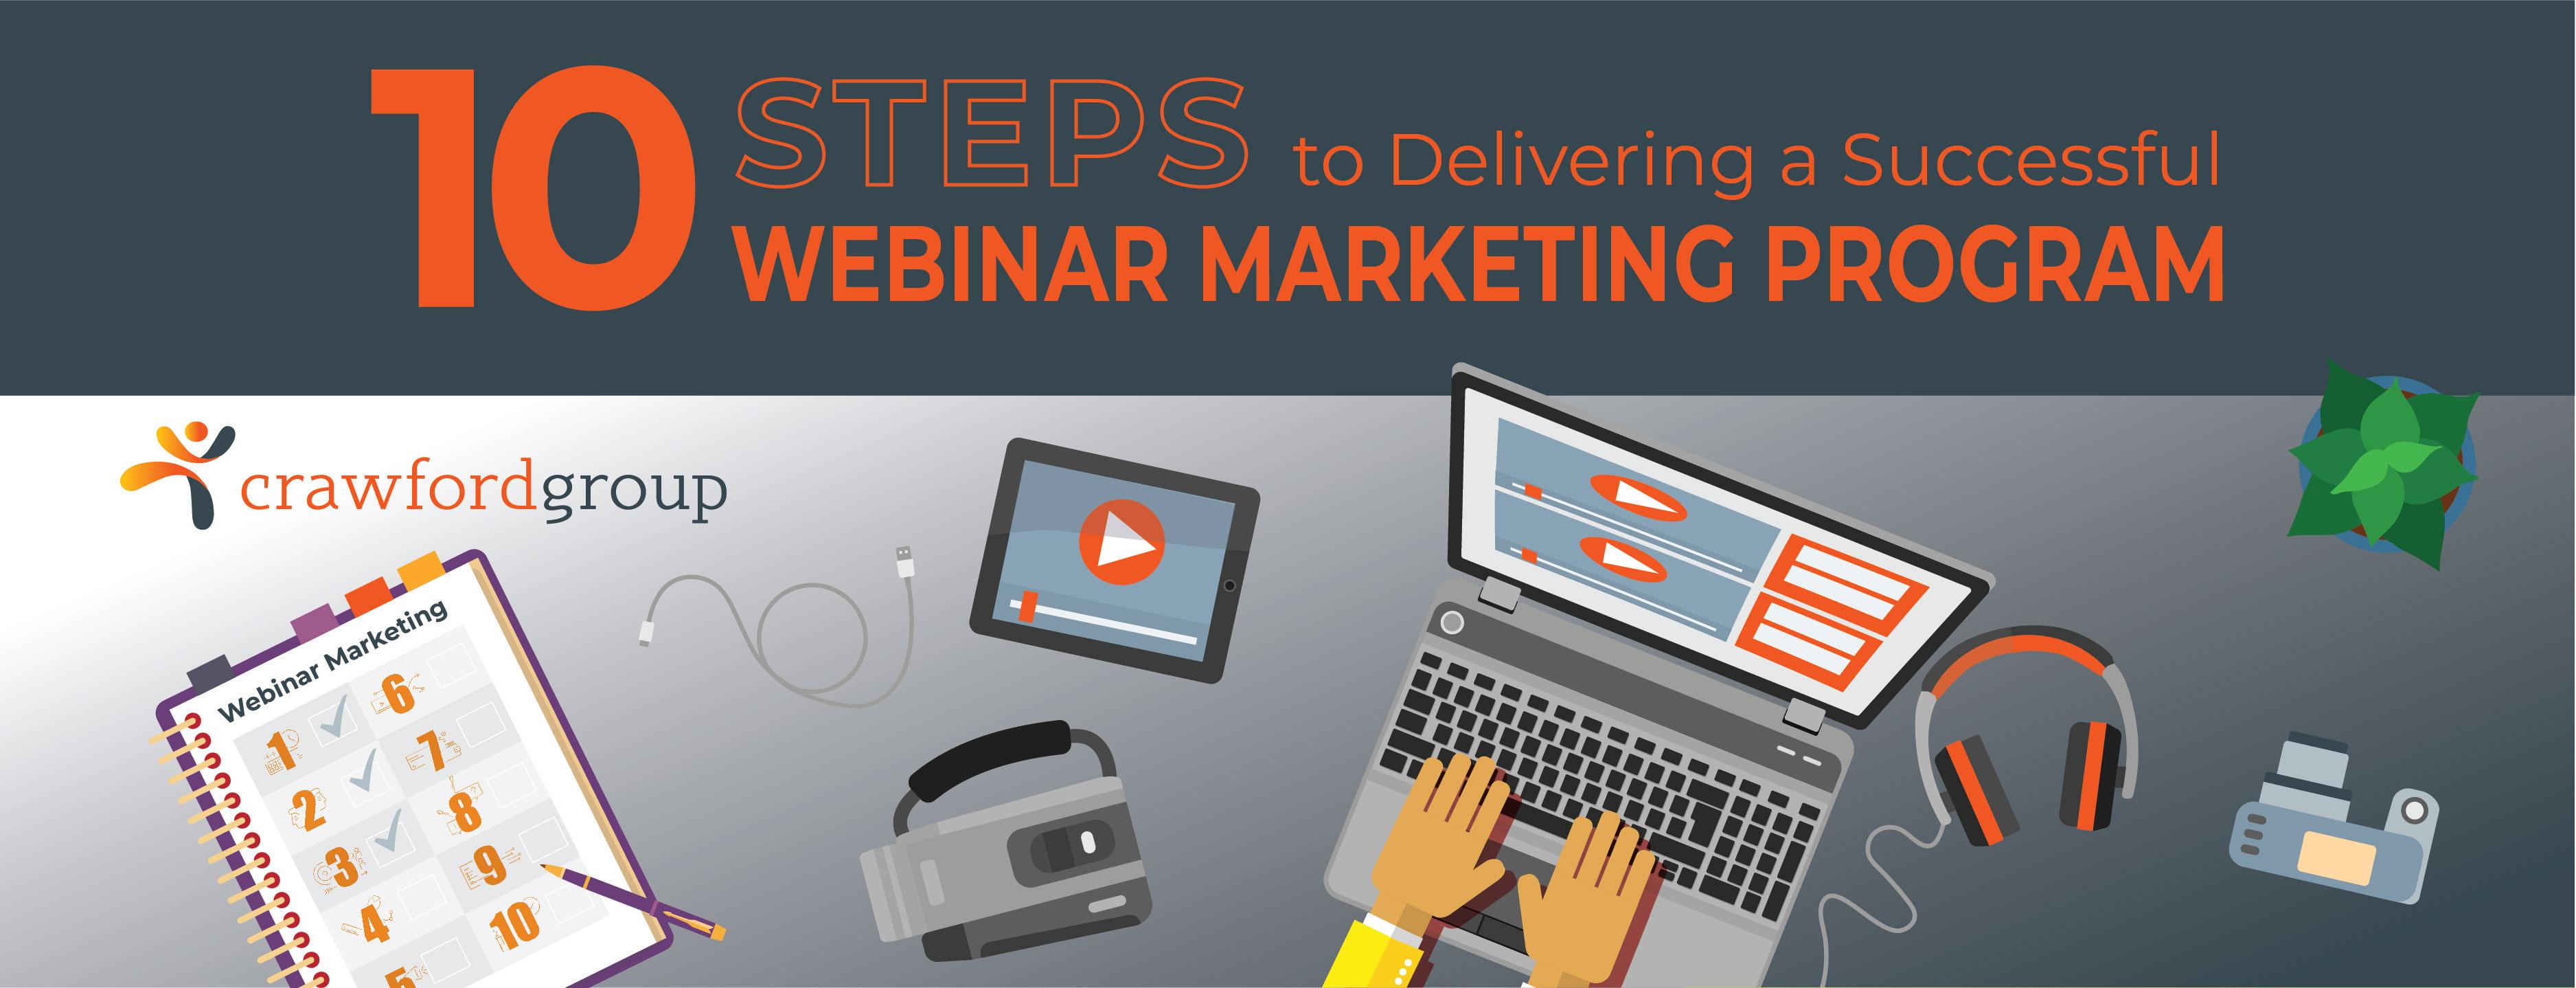 blog_10-steps-successful-webinar